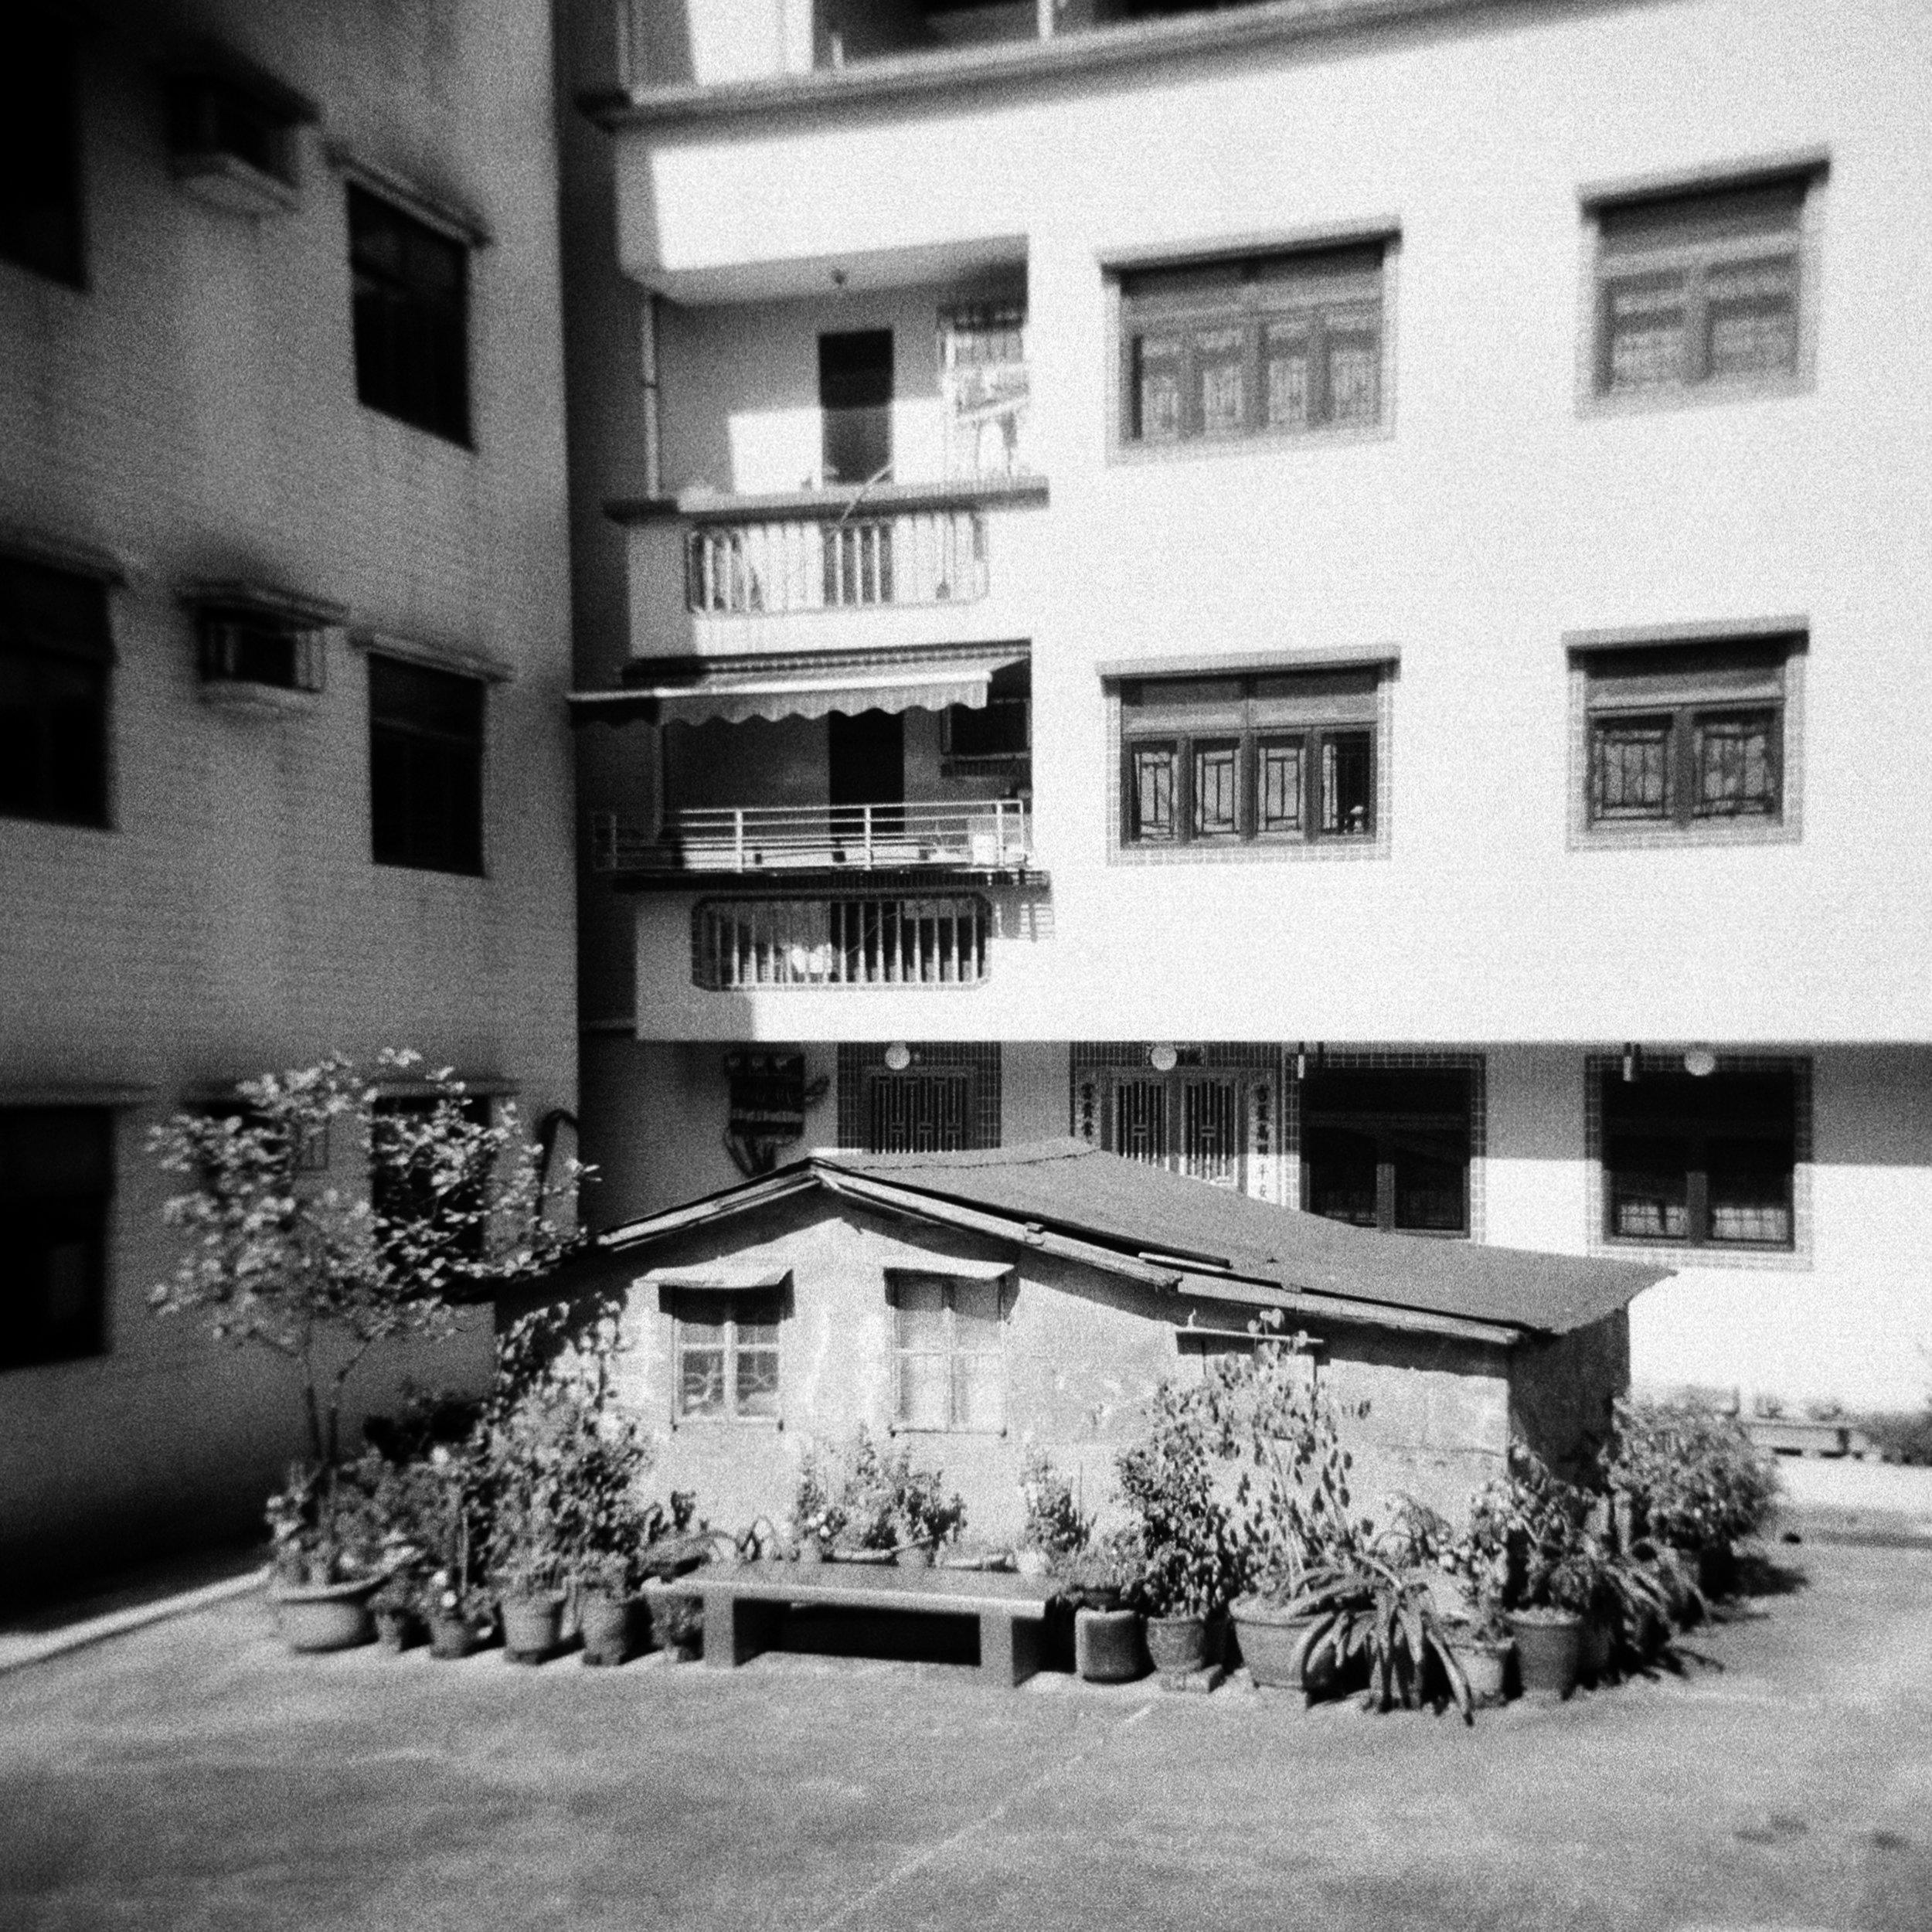 Little House, Roland Buckingham-Hsiao